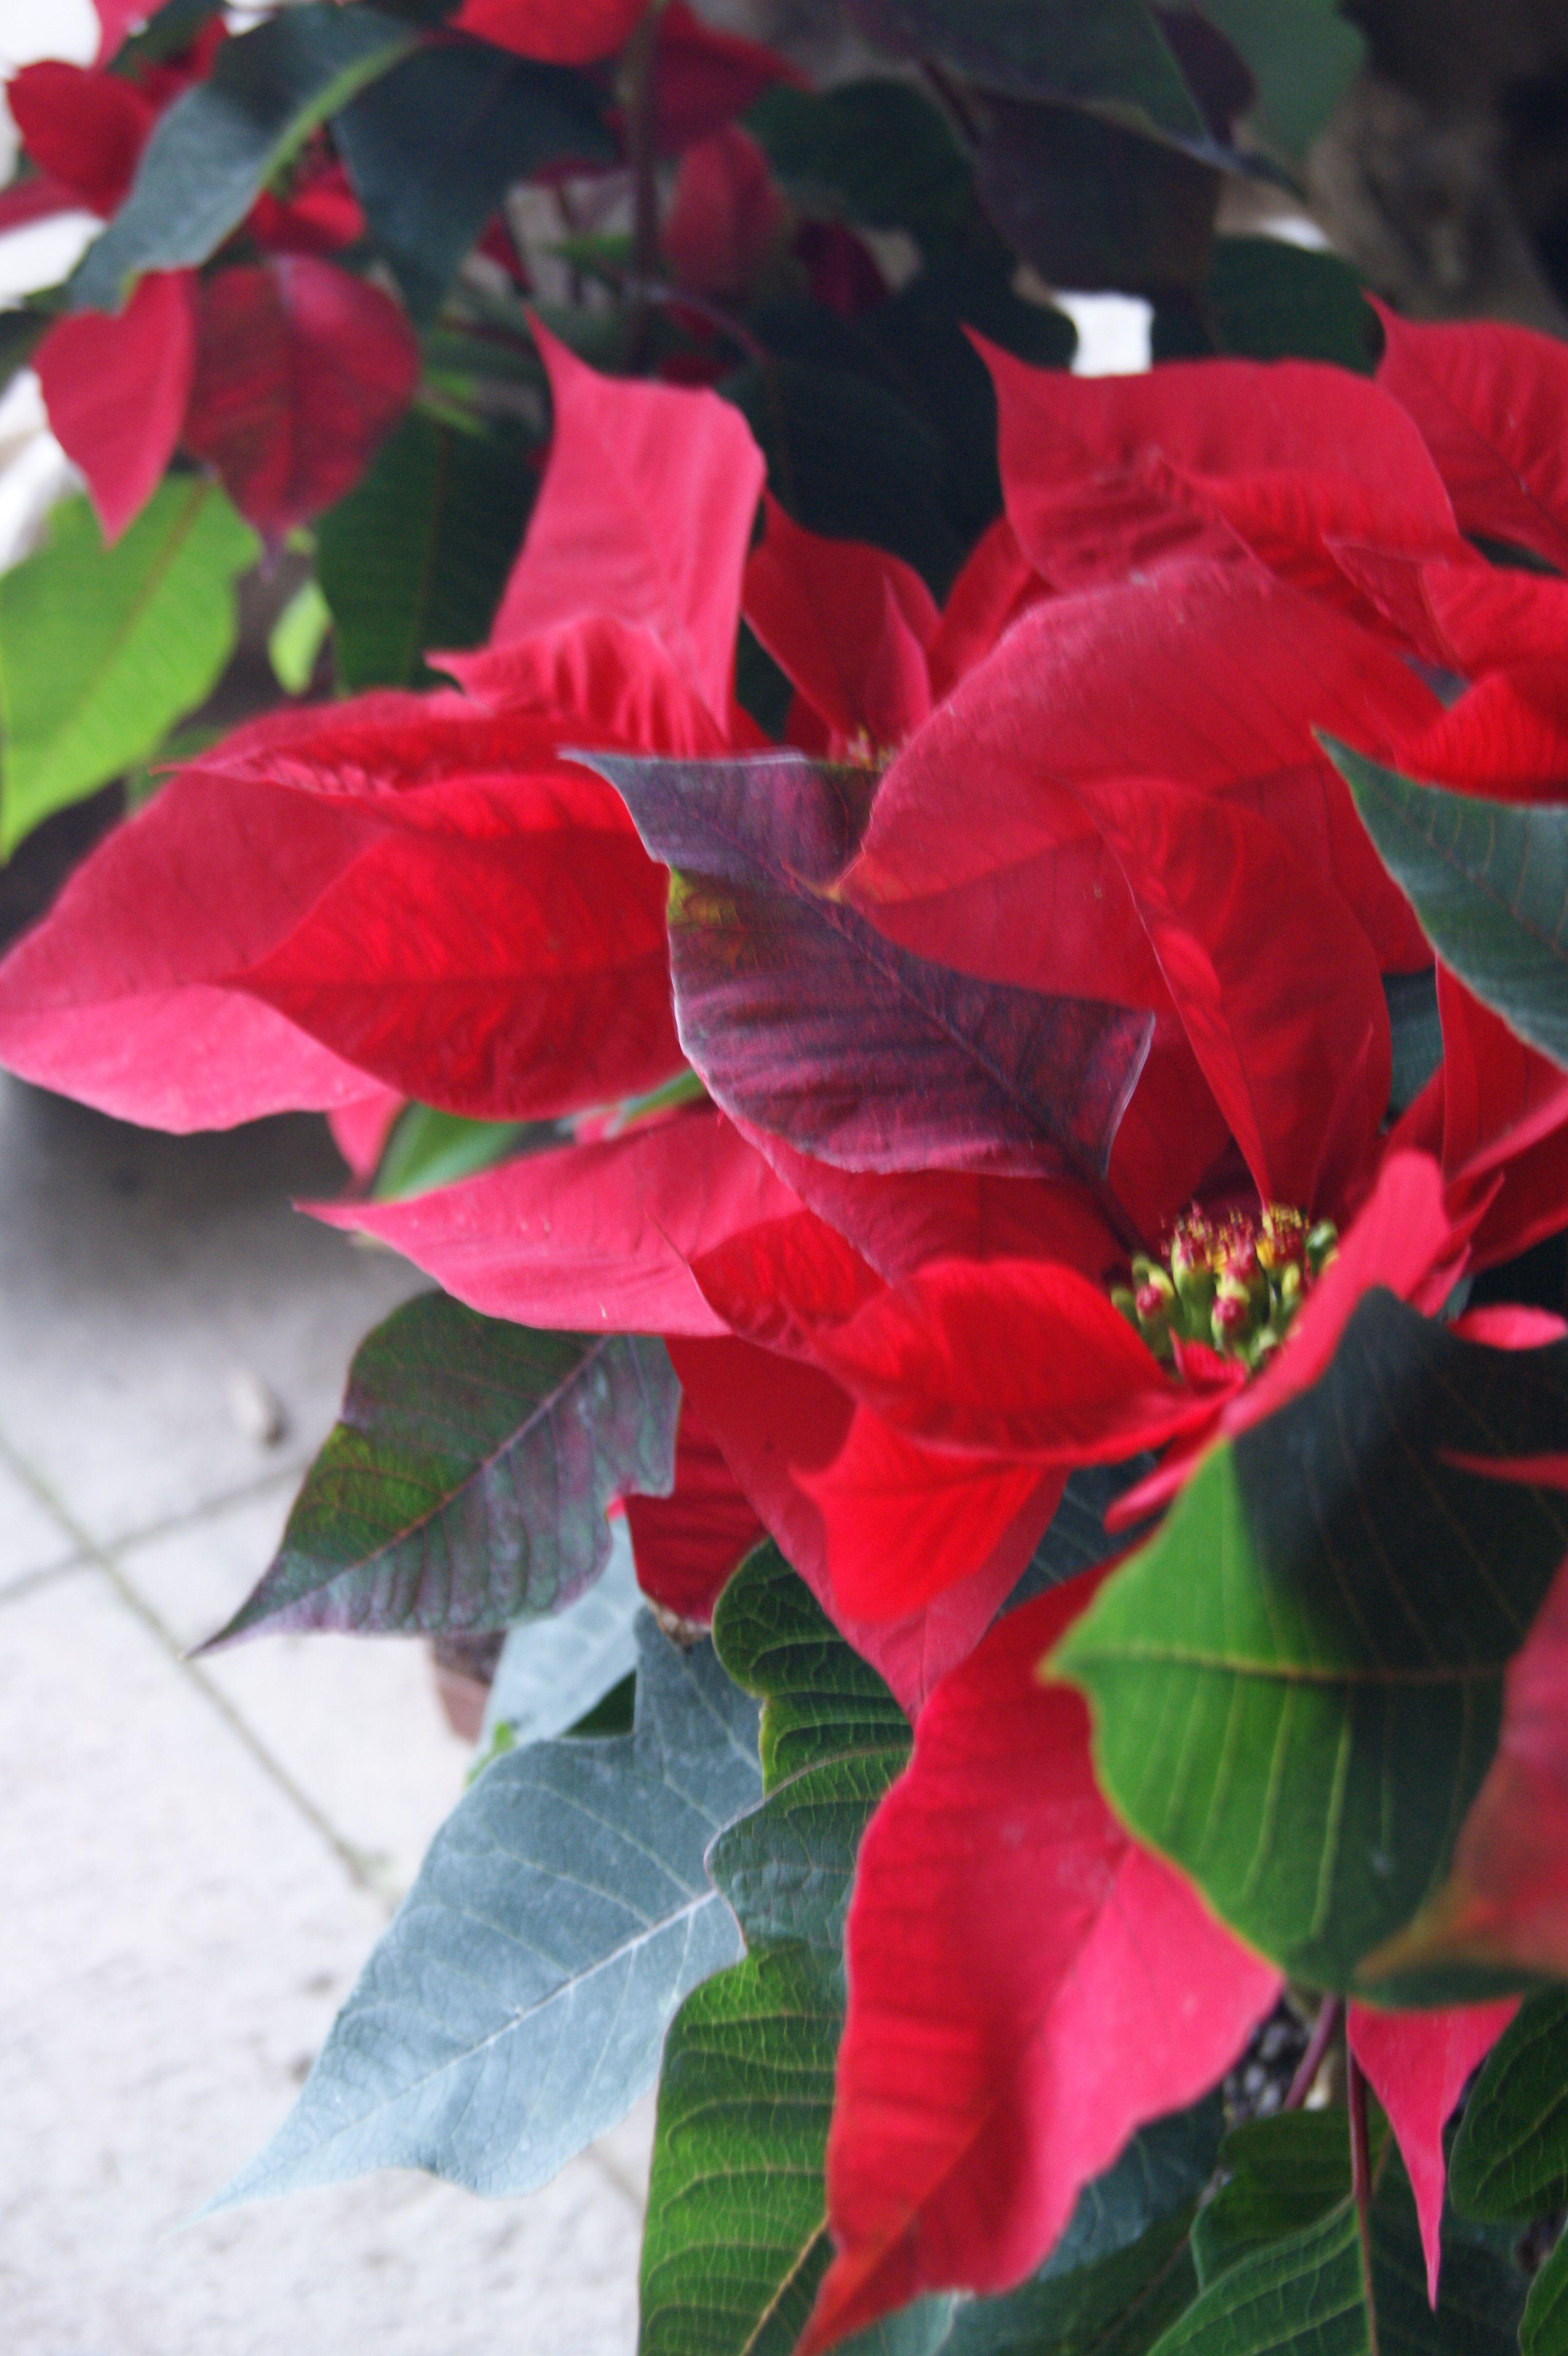 Euphorbia Pulcherrima Conocida Comunmente Como Pastora Pascuero Noche Buena Flor De Pascua Estrella Federal O Christmas Flowers Picking Flowers Poinsettia